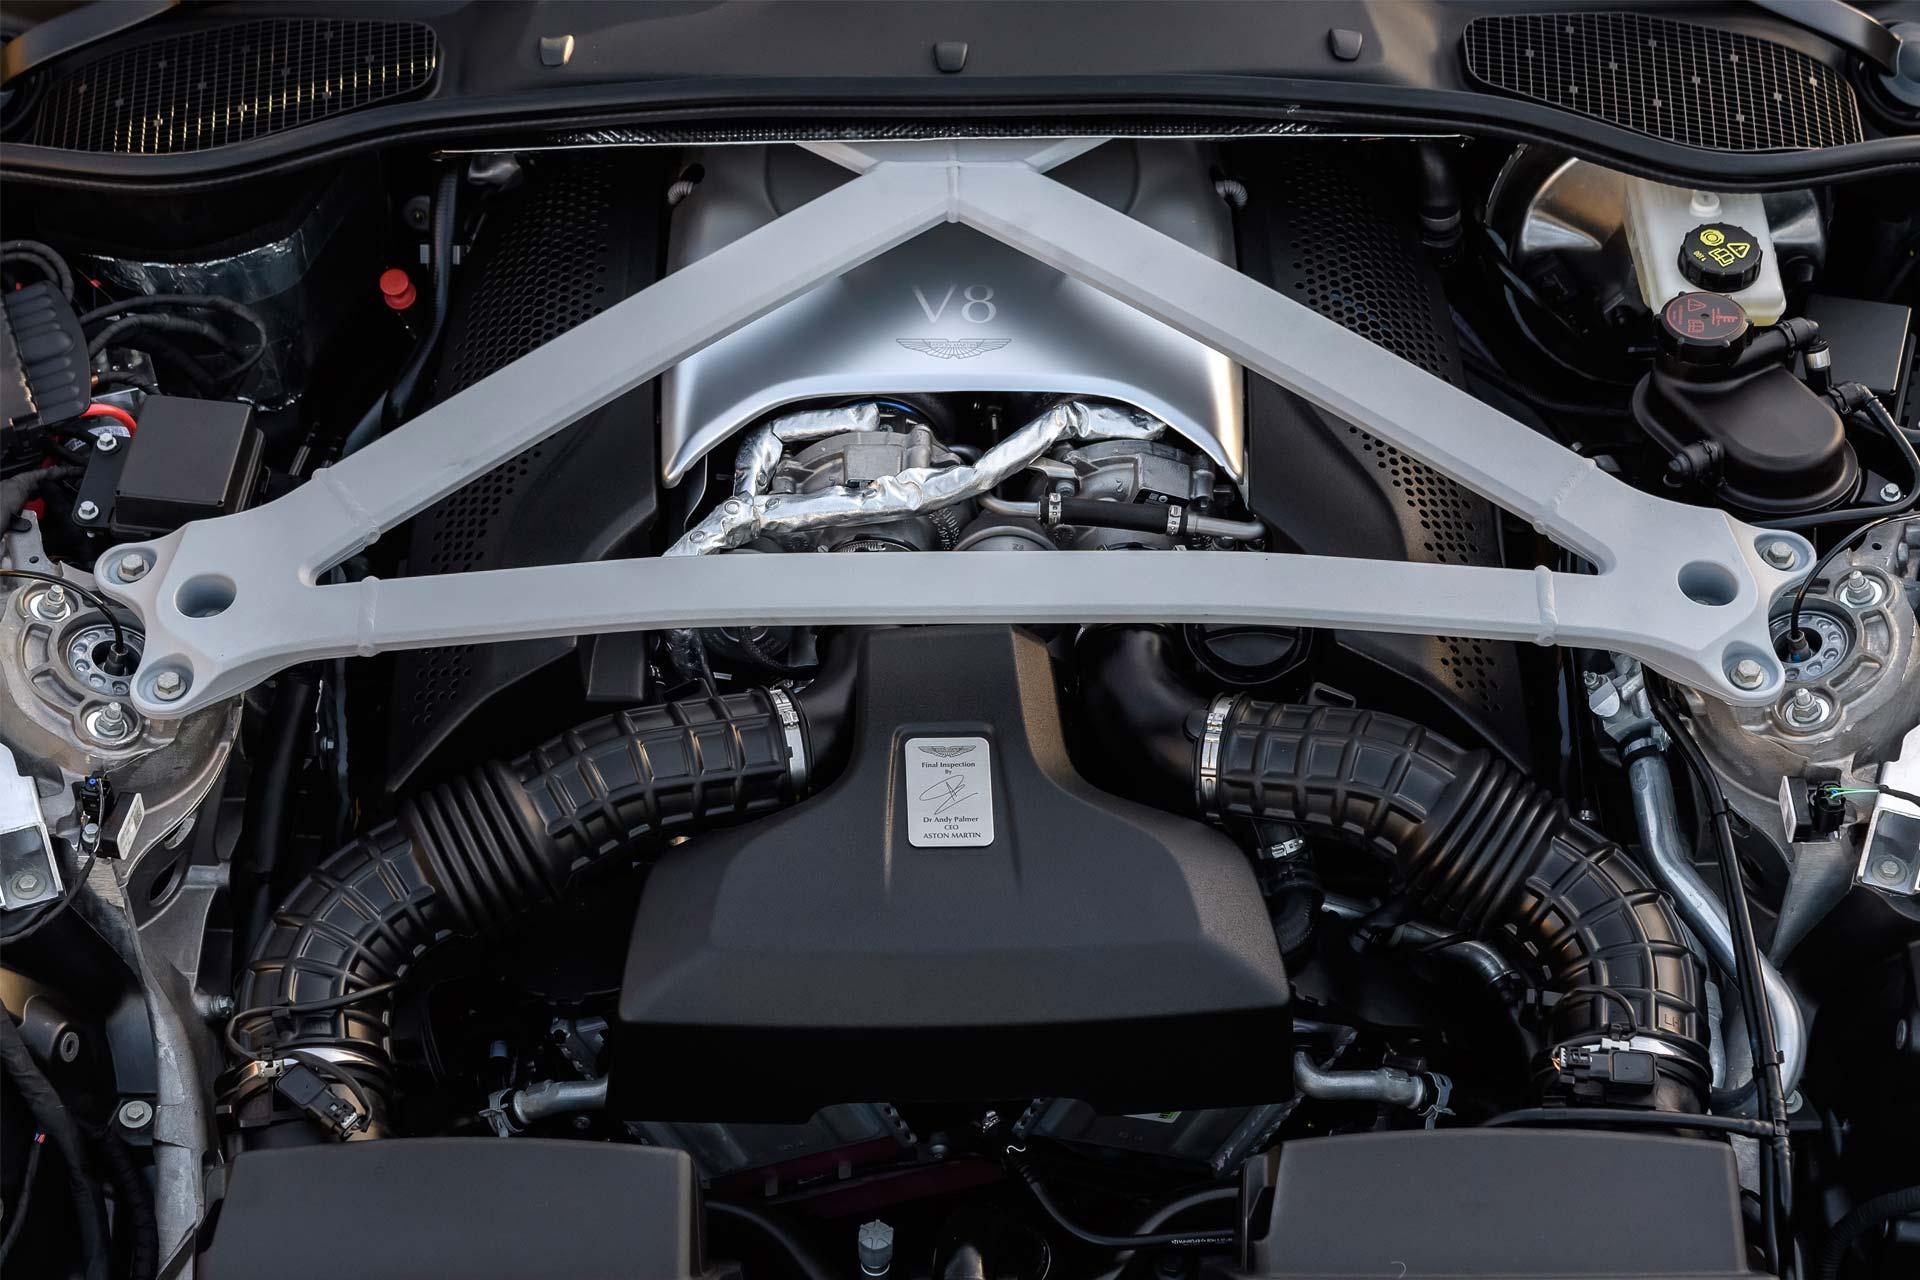 Aston-Martin-DB11-4.0-V8-5